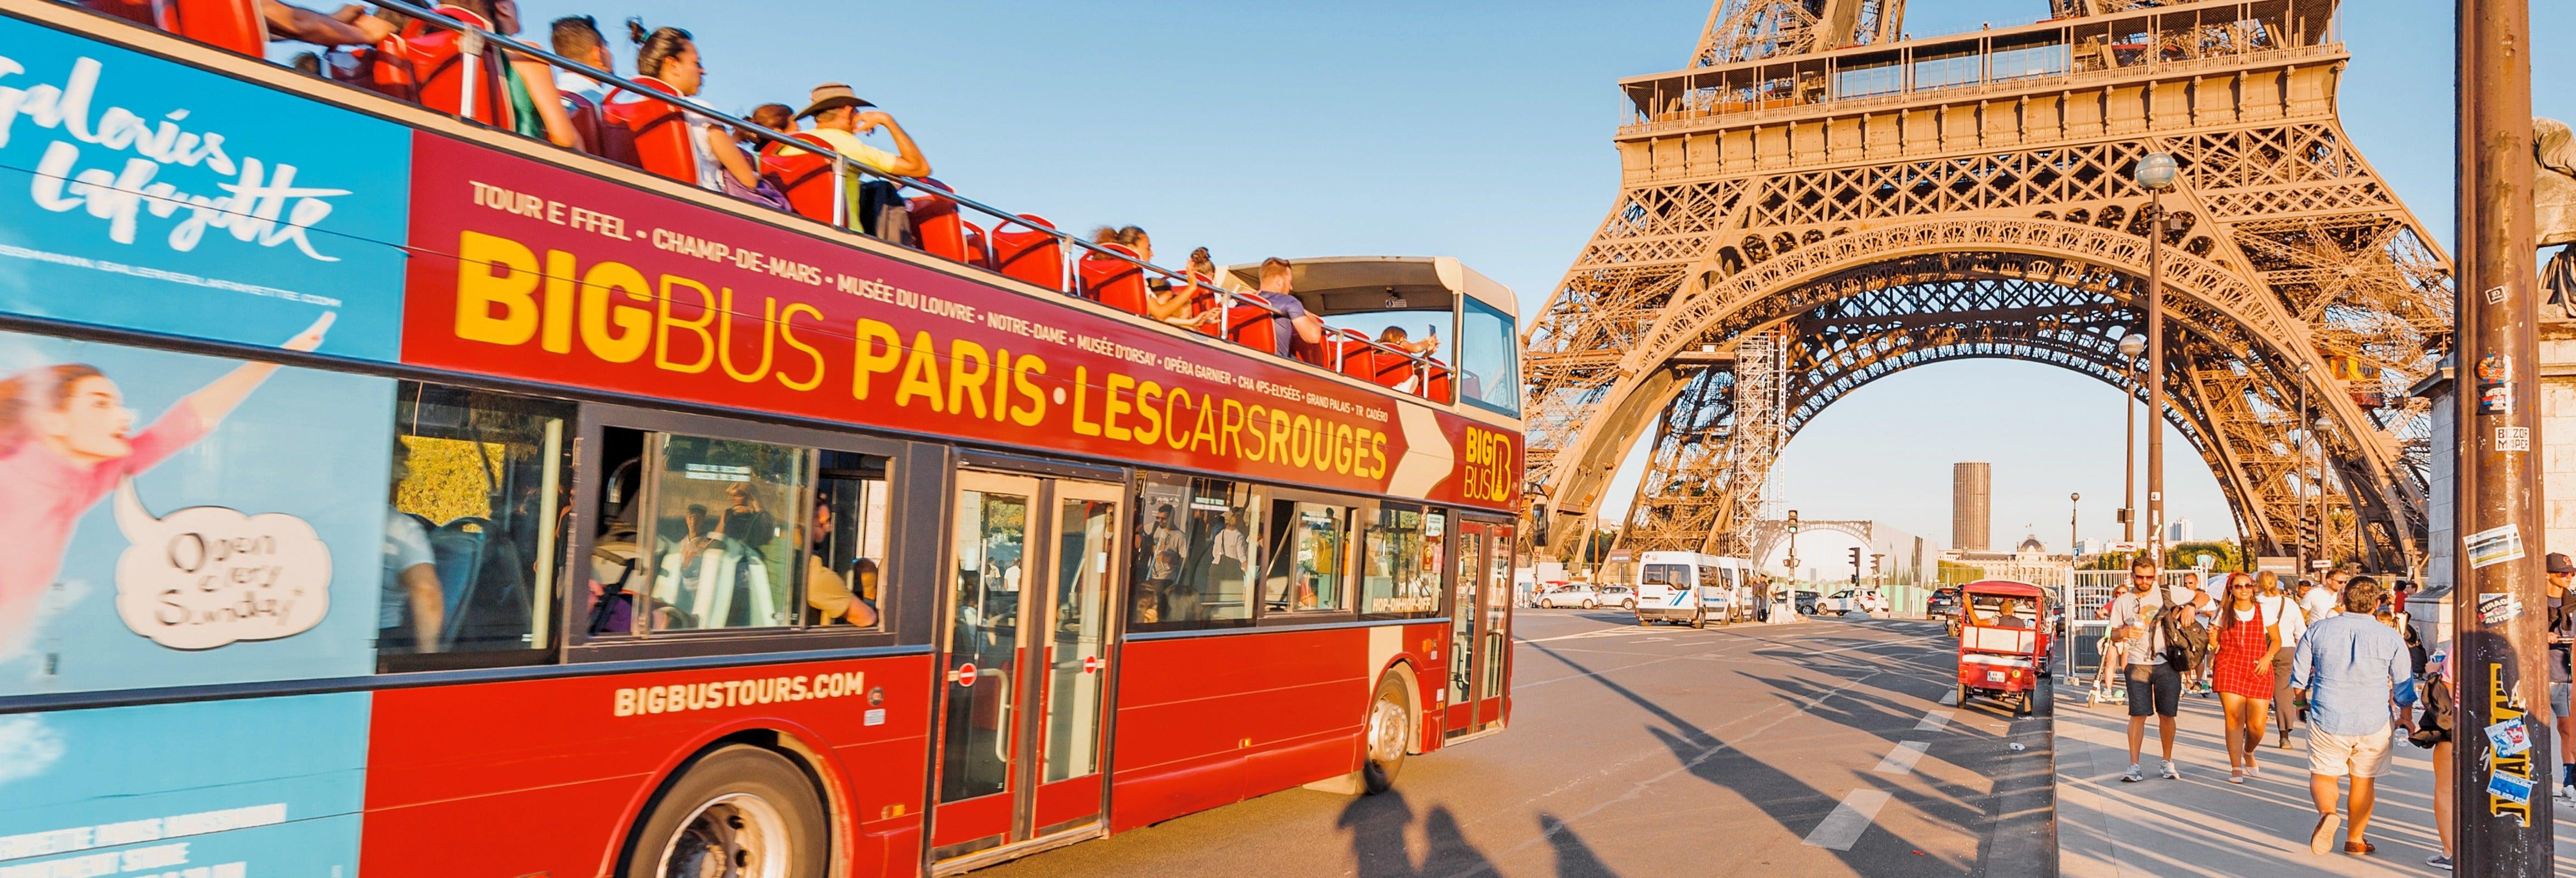 Ônibus turístico de Paris